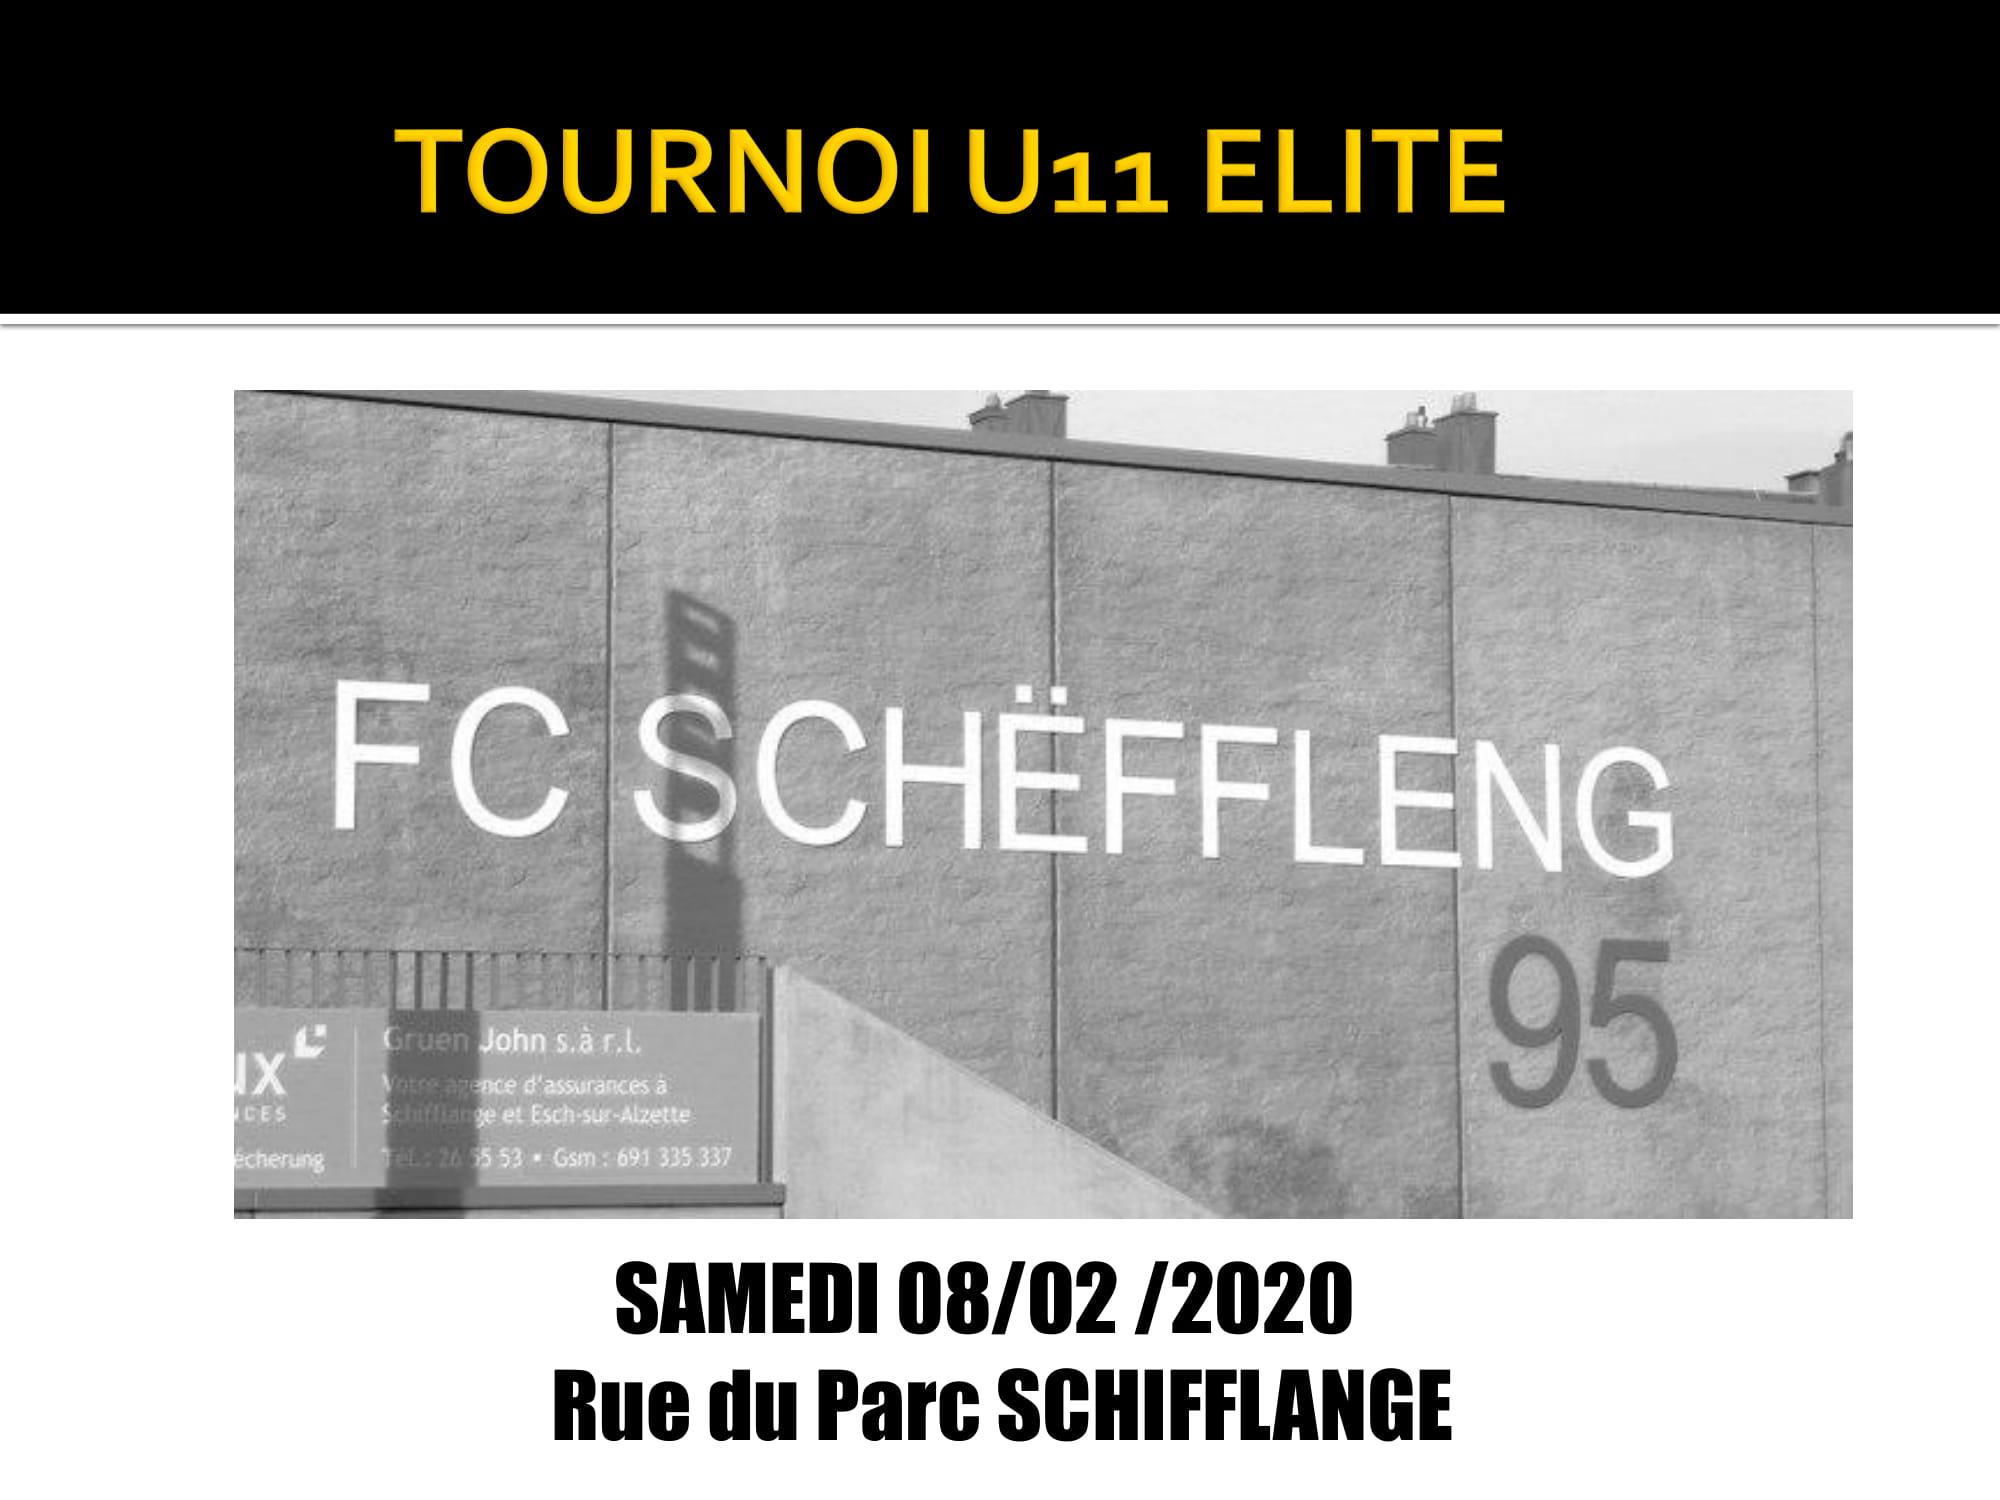 Tournoi U11 Elite  samedi 08.02.20